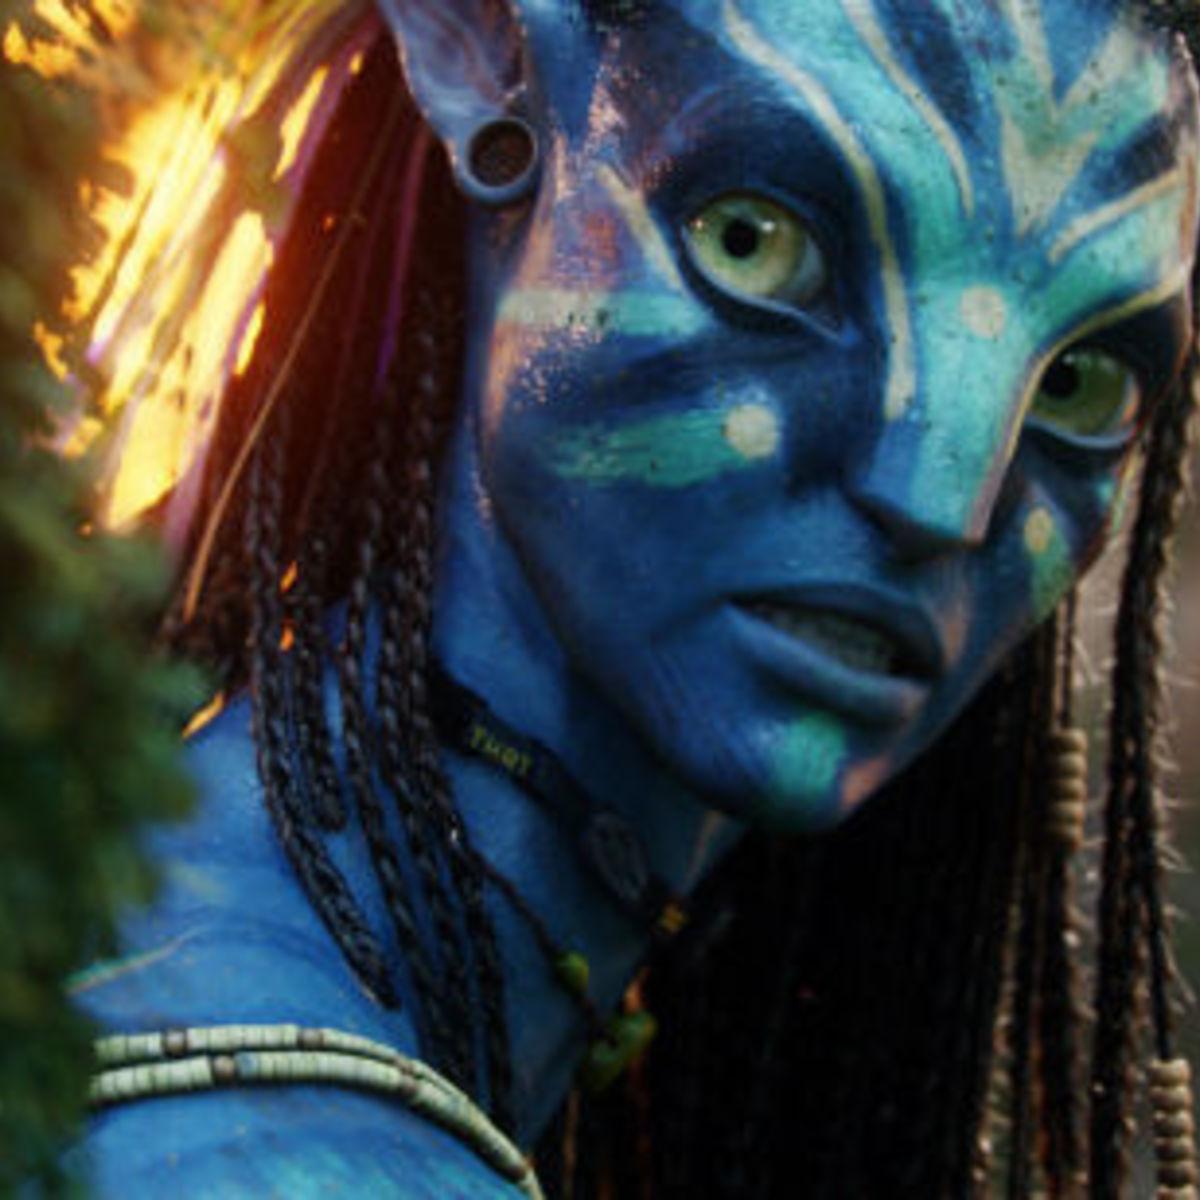 Avatar_neytiri_saldana_facepaint_10.jpg